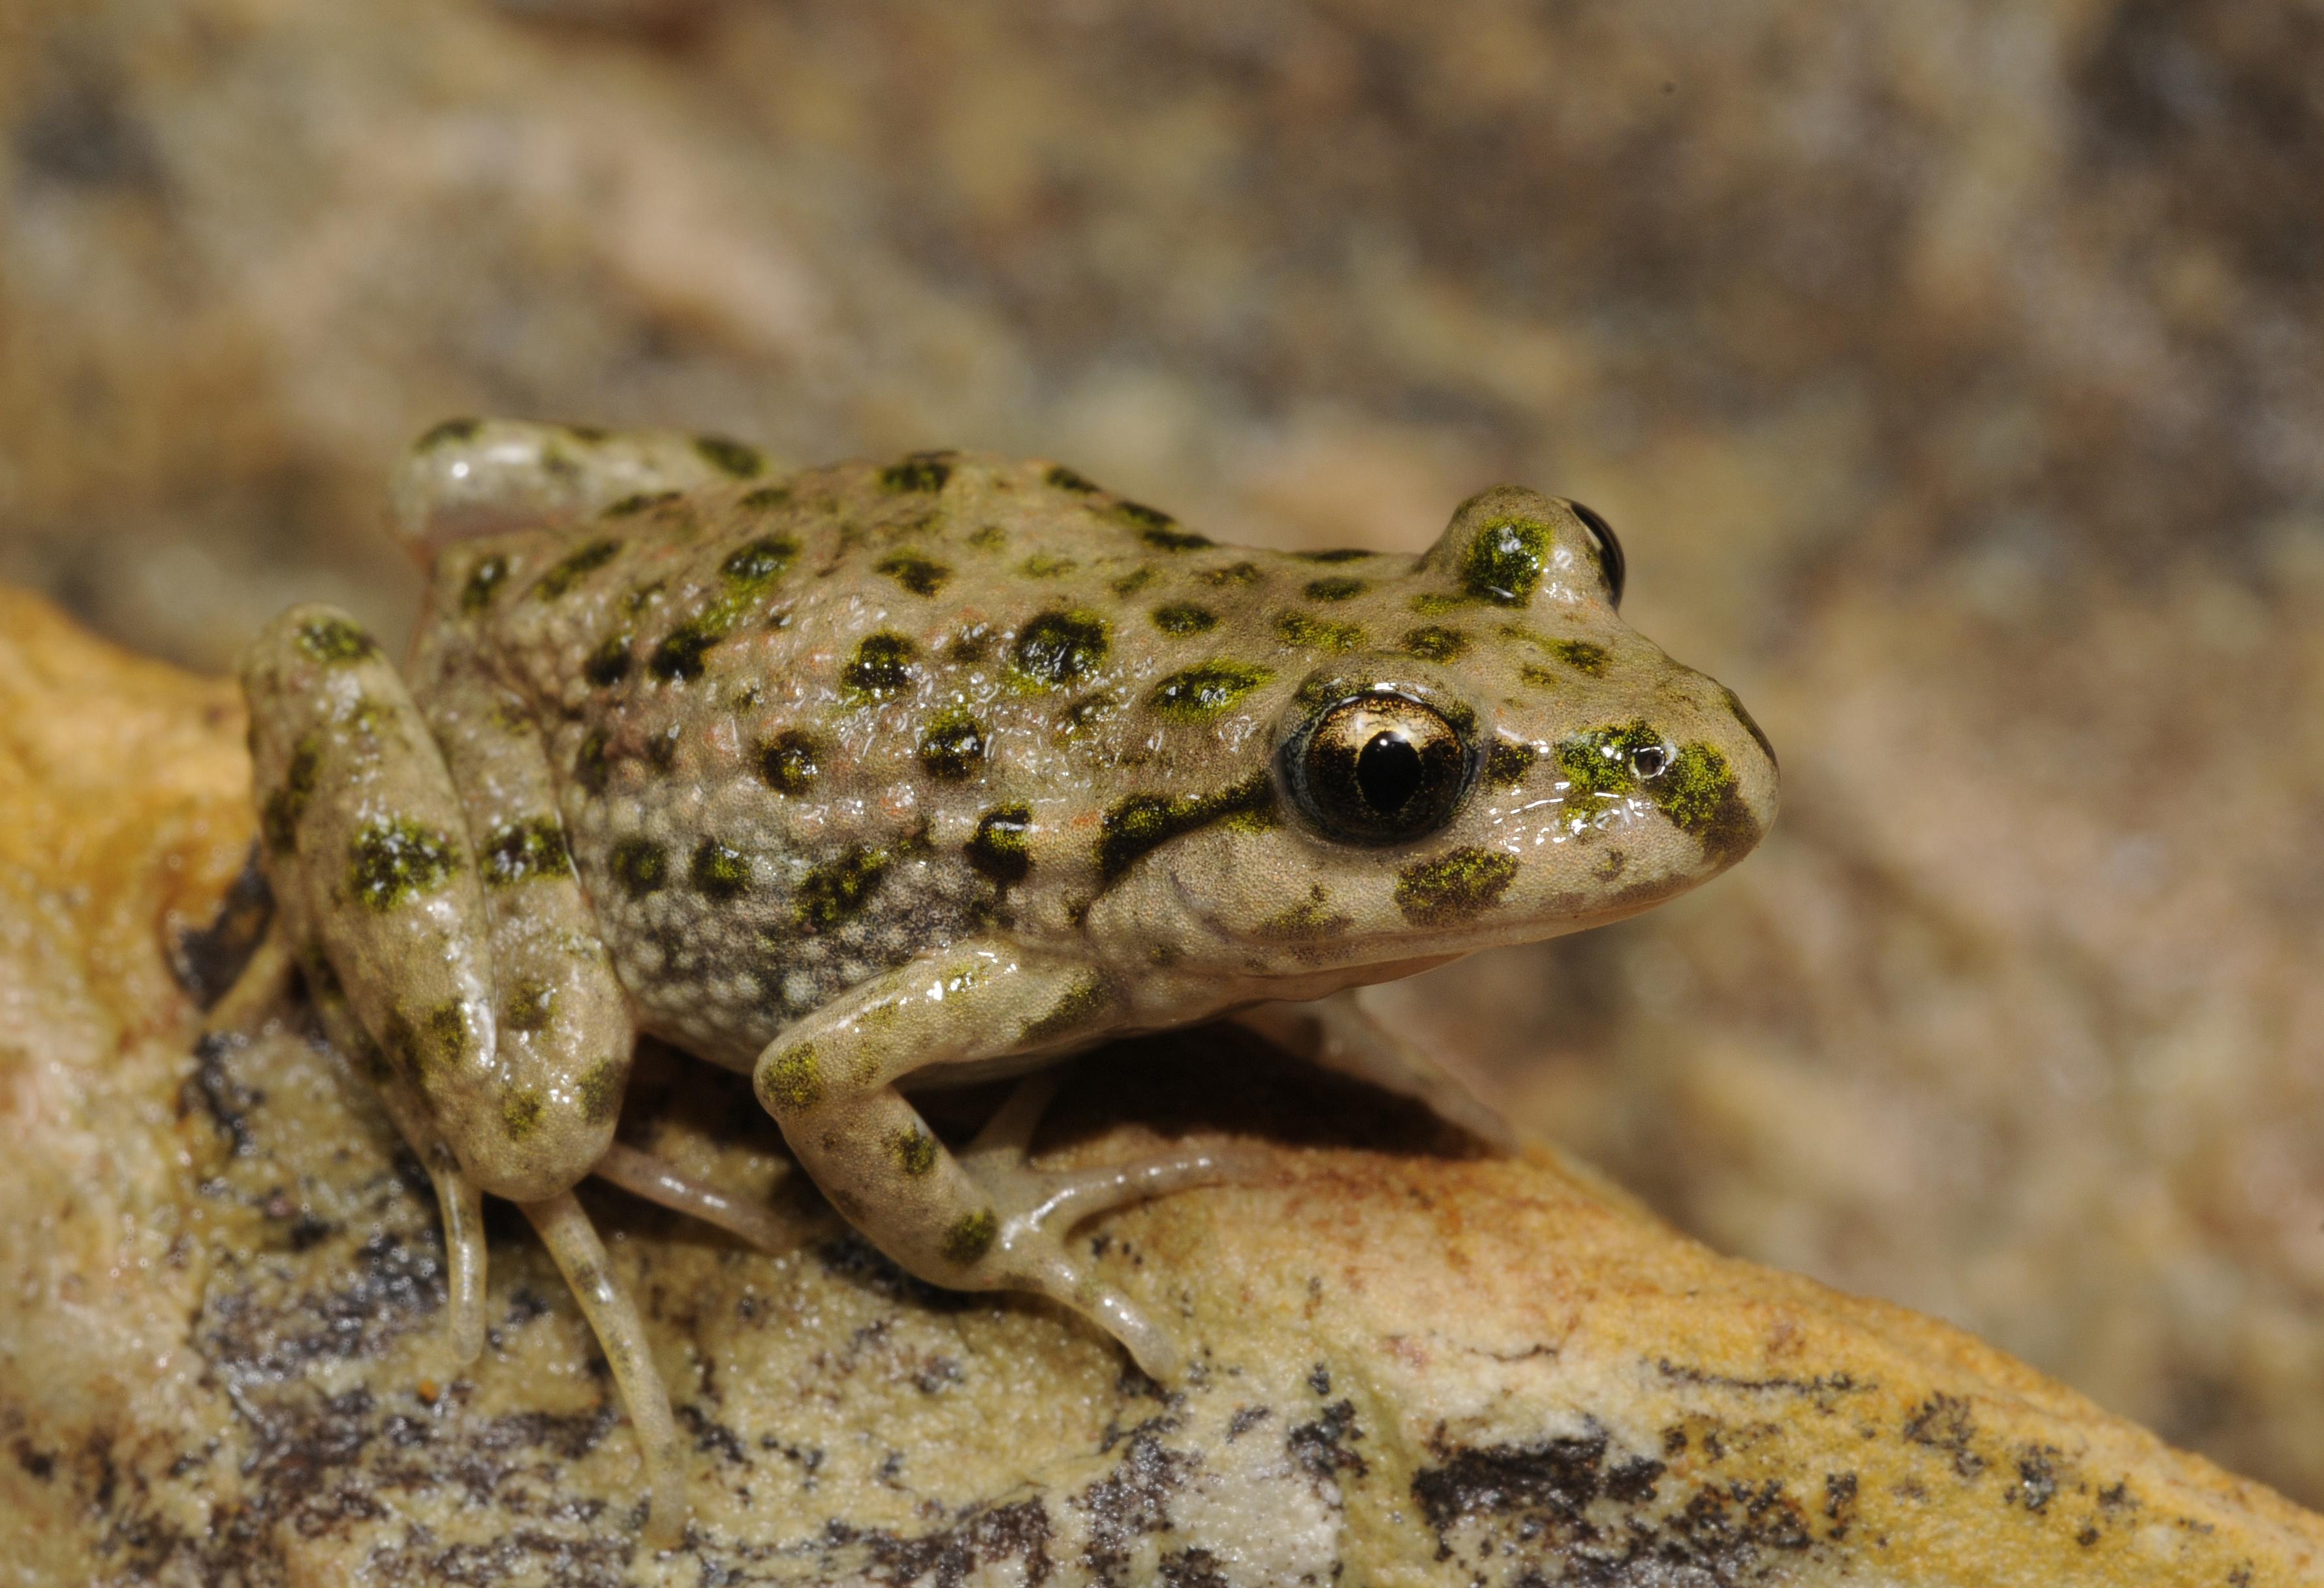 Image of Iberian Parsley Frog